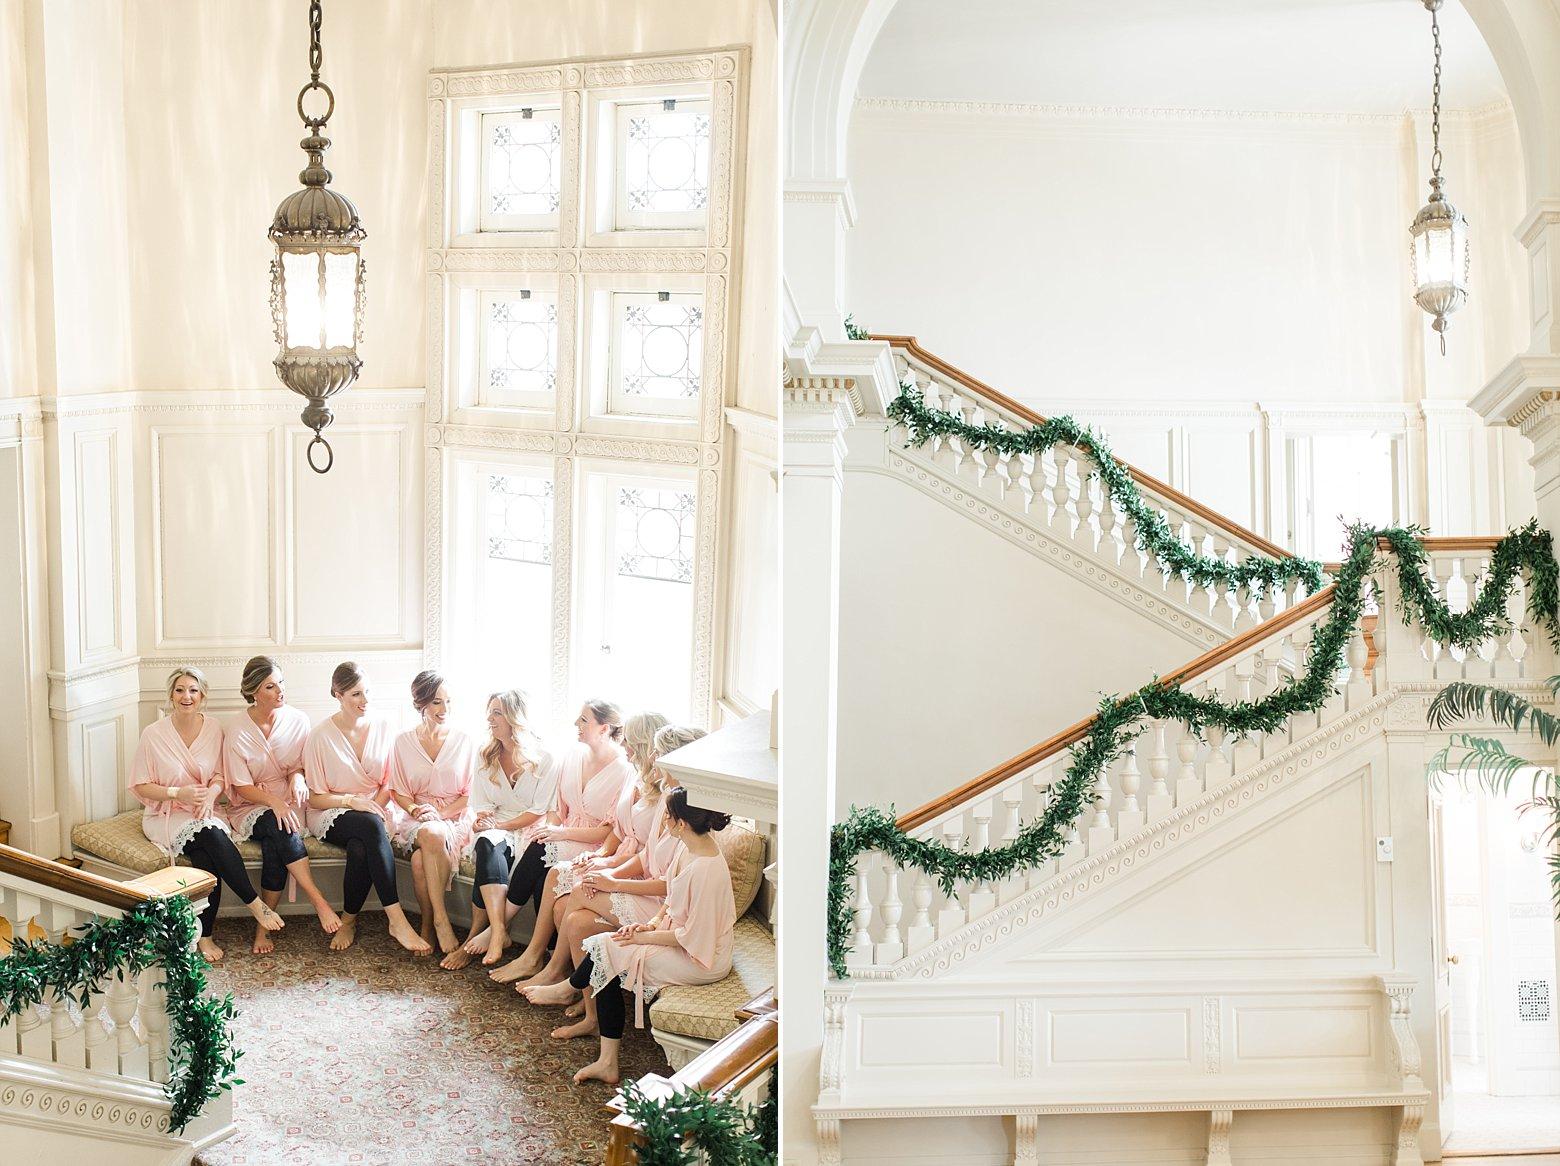 lauren_fair_photography_april_lynn_designs_stasia_matt_spring_cairnwood_estate_wedding_northeast_philadelphia_blush_pink_gold_wedding_invitation_stationery_00012